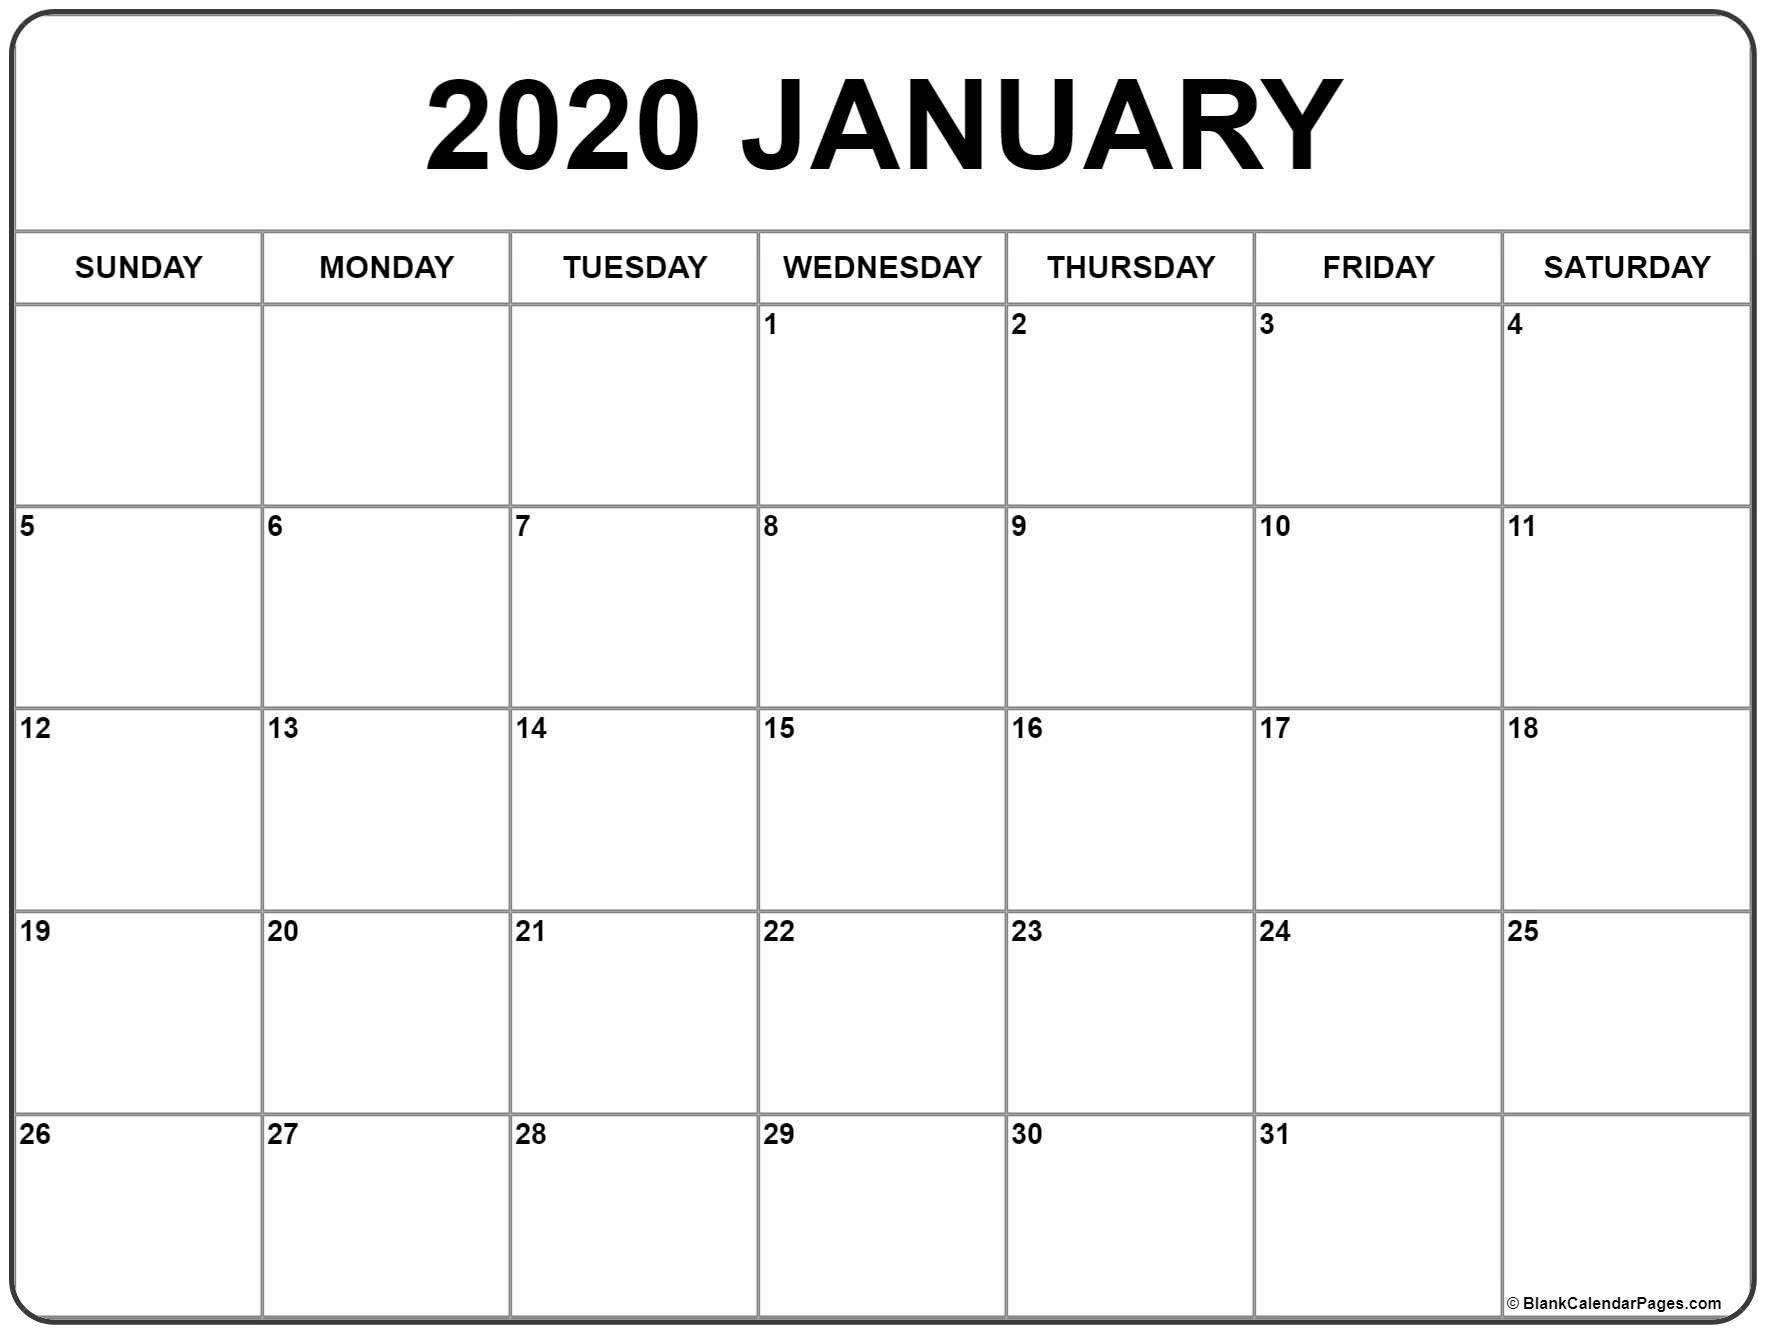 January 2020 Calendar | Free Printable Monthly Calendars throughout Printable Disney Calendar 2020